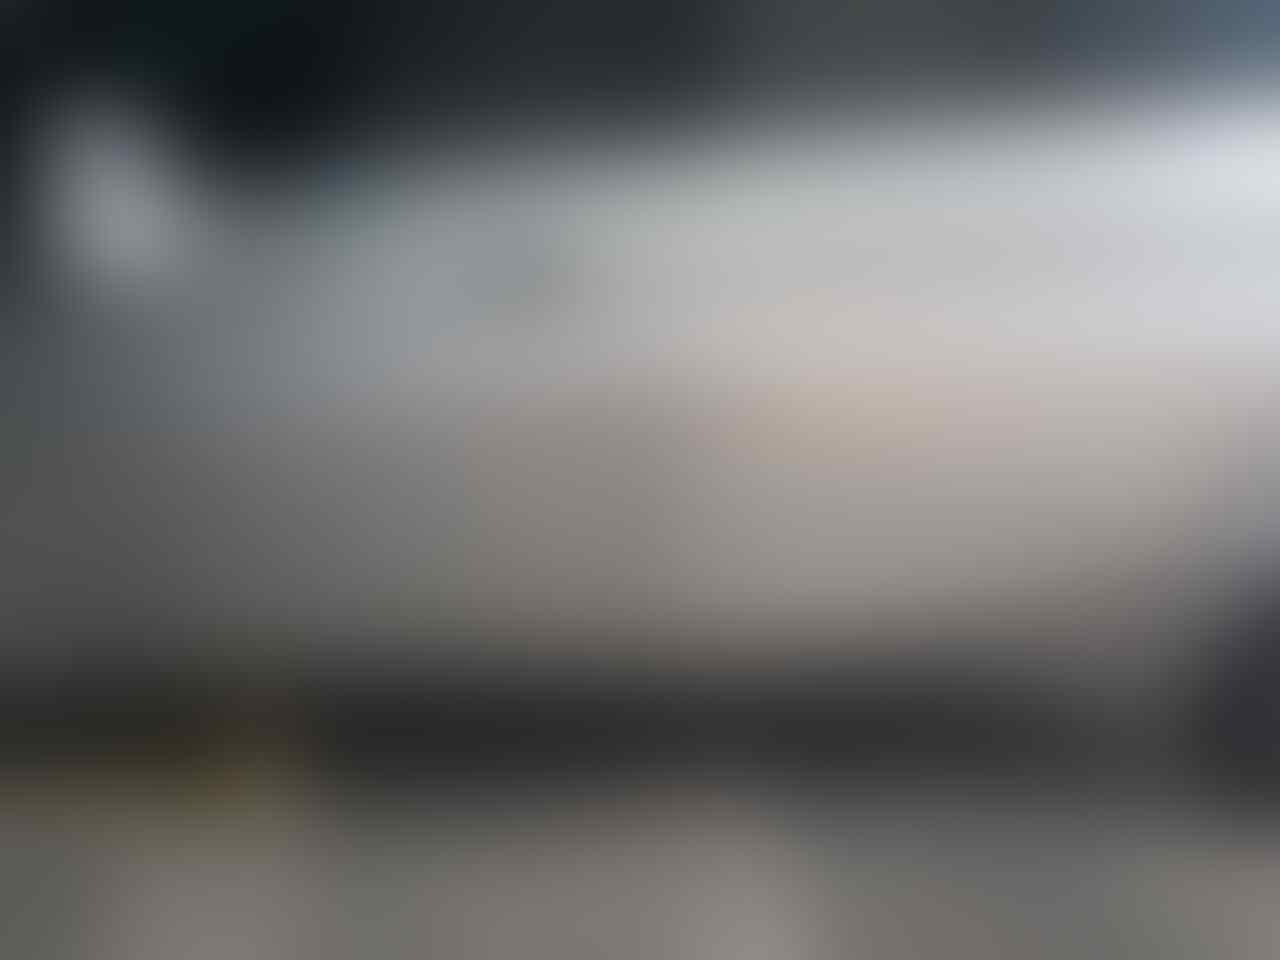 Mitsubishi Xpander - Next Generation MPV - Part 1